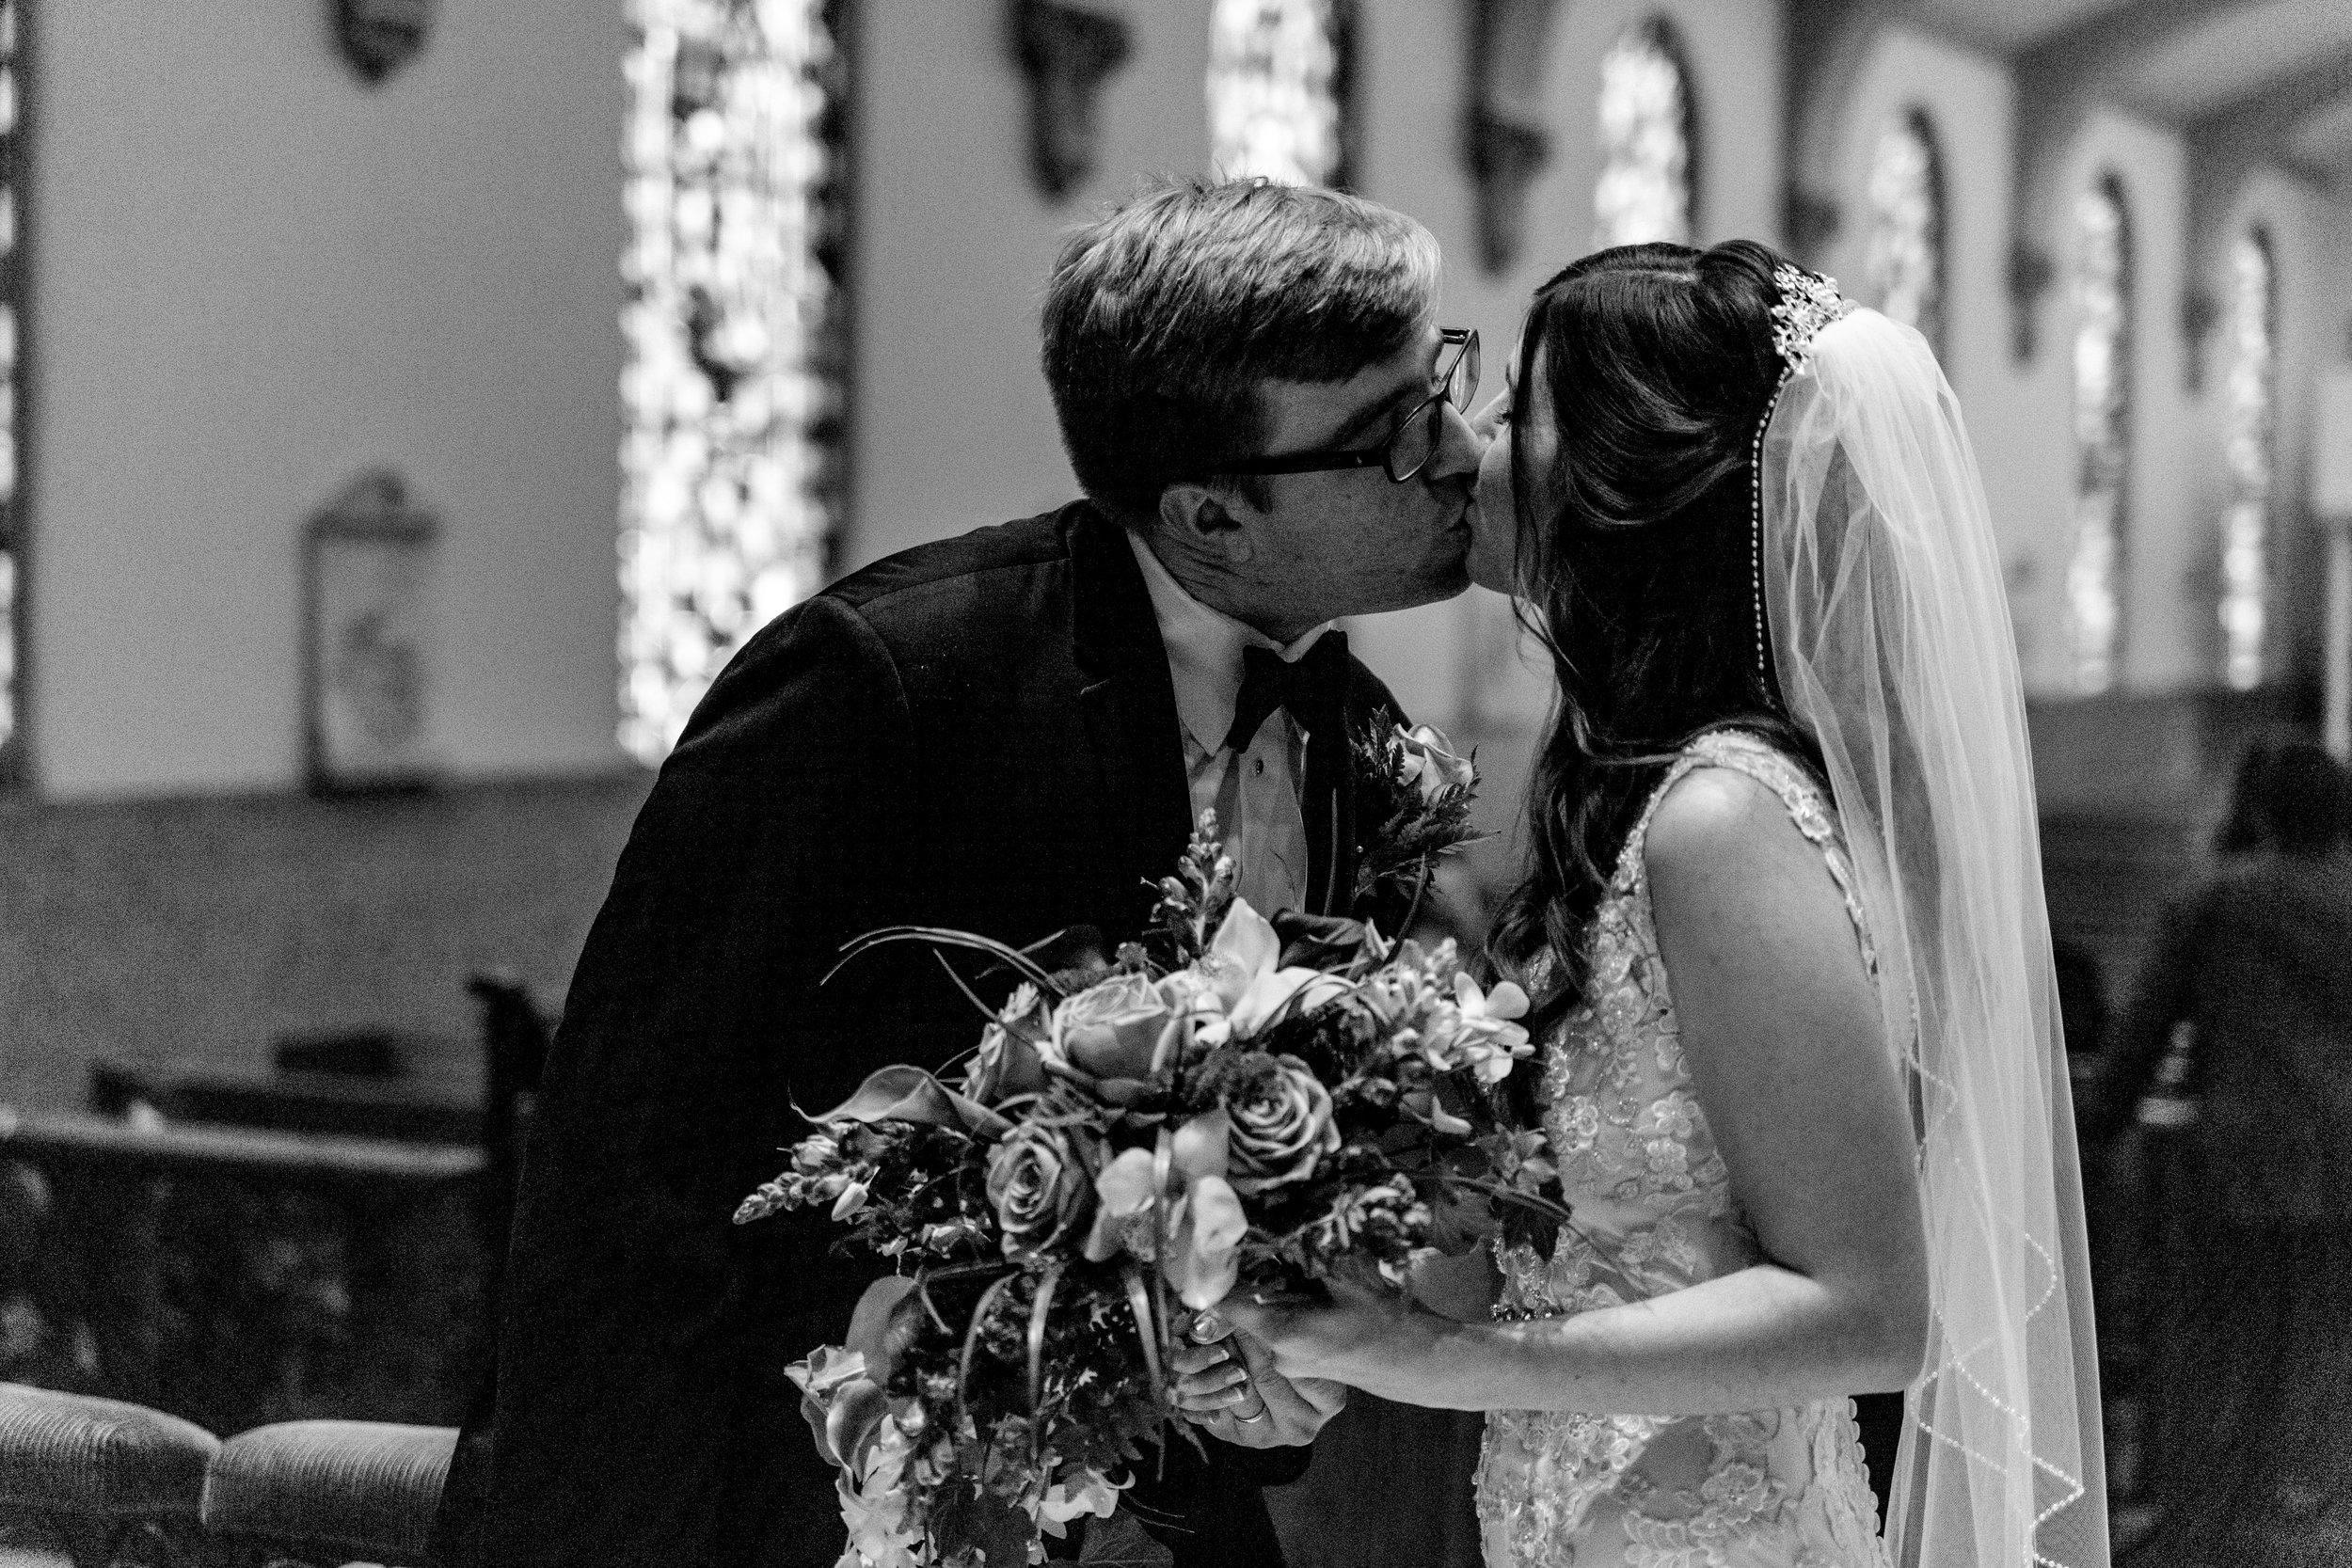 HAH_Zoe and Daniel_Clearwater Wedding_253_2018.jpg